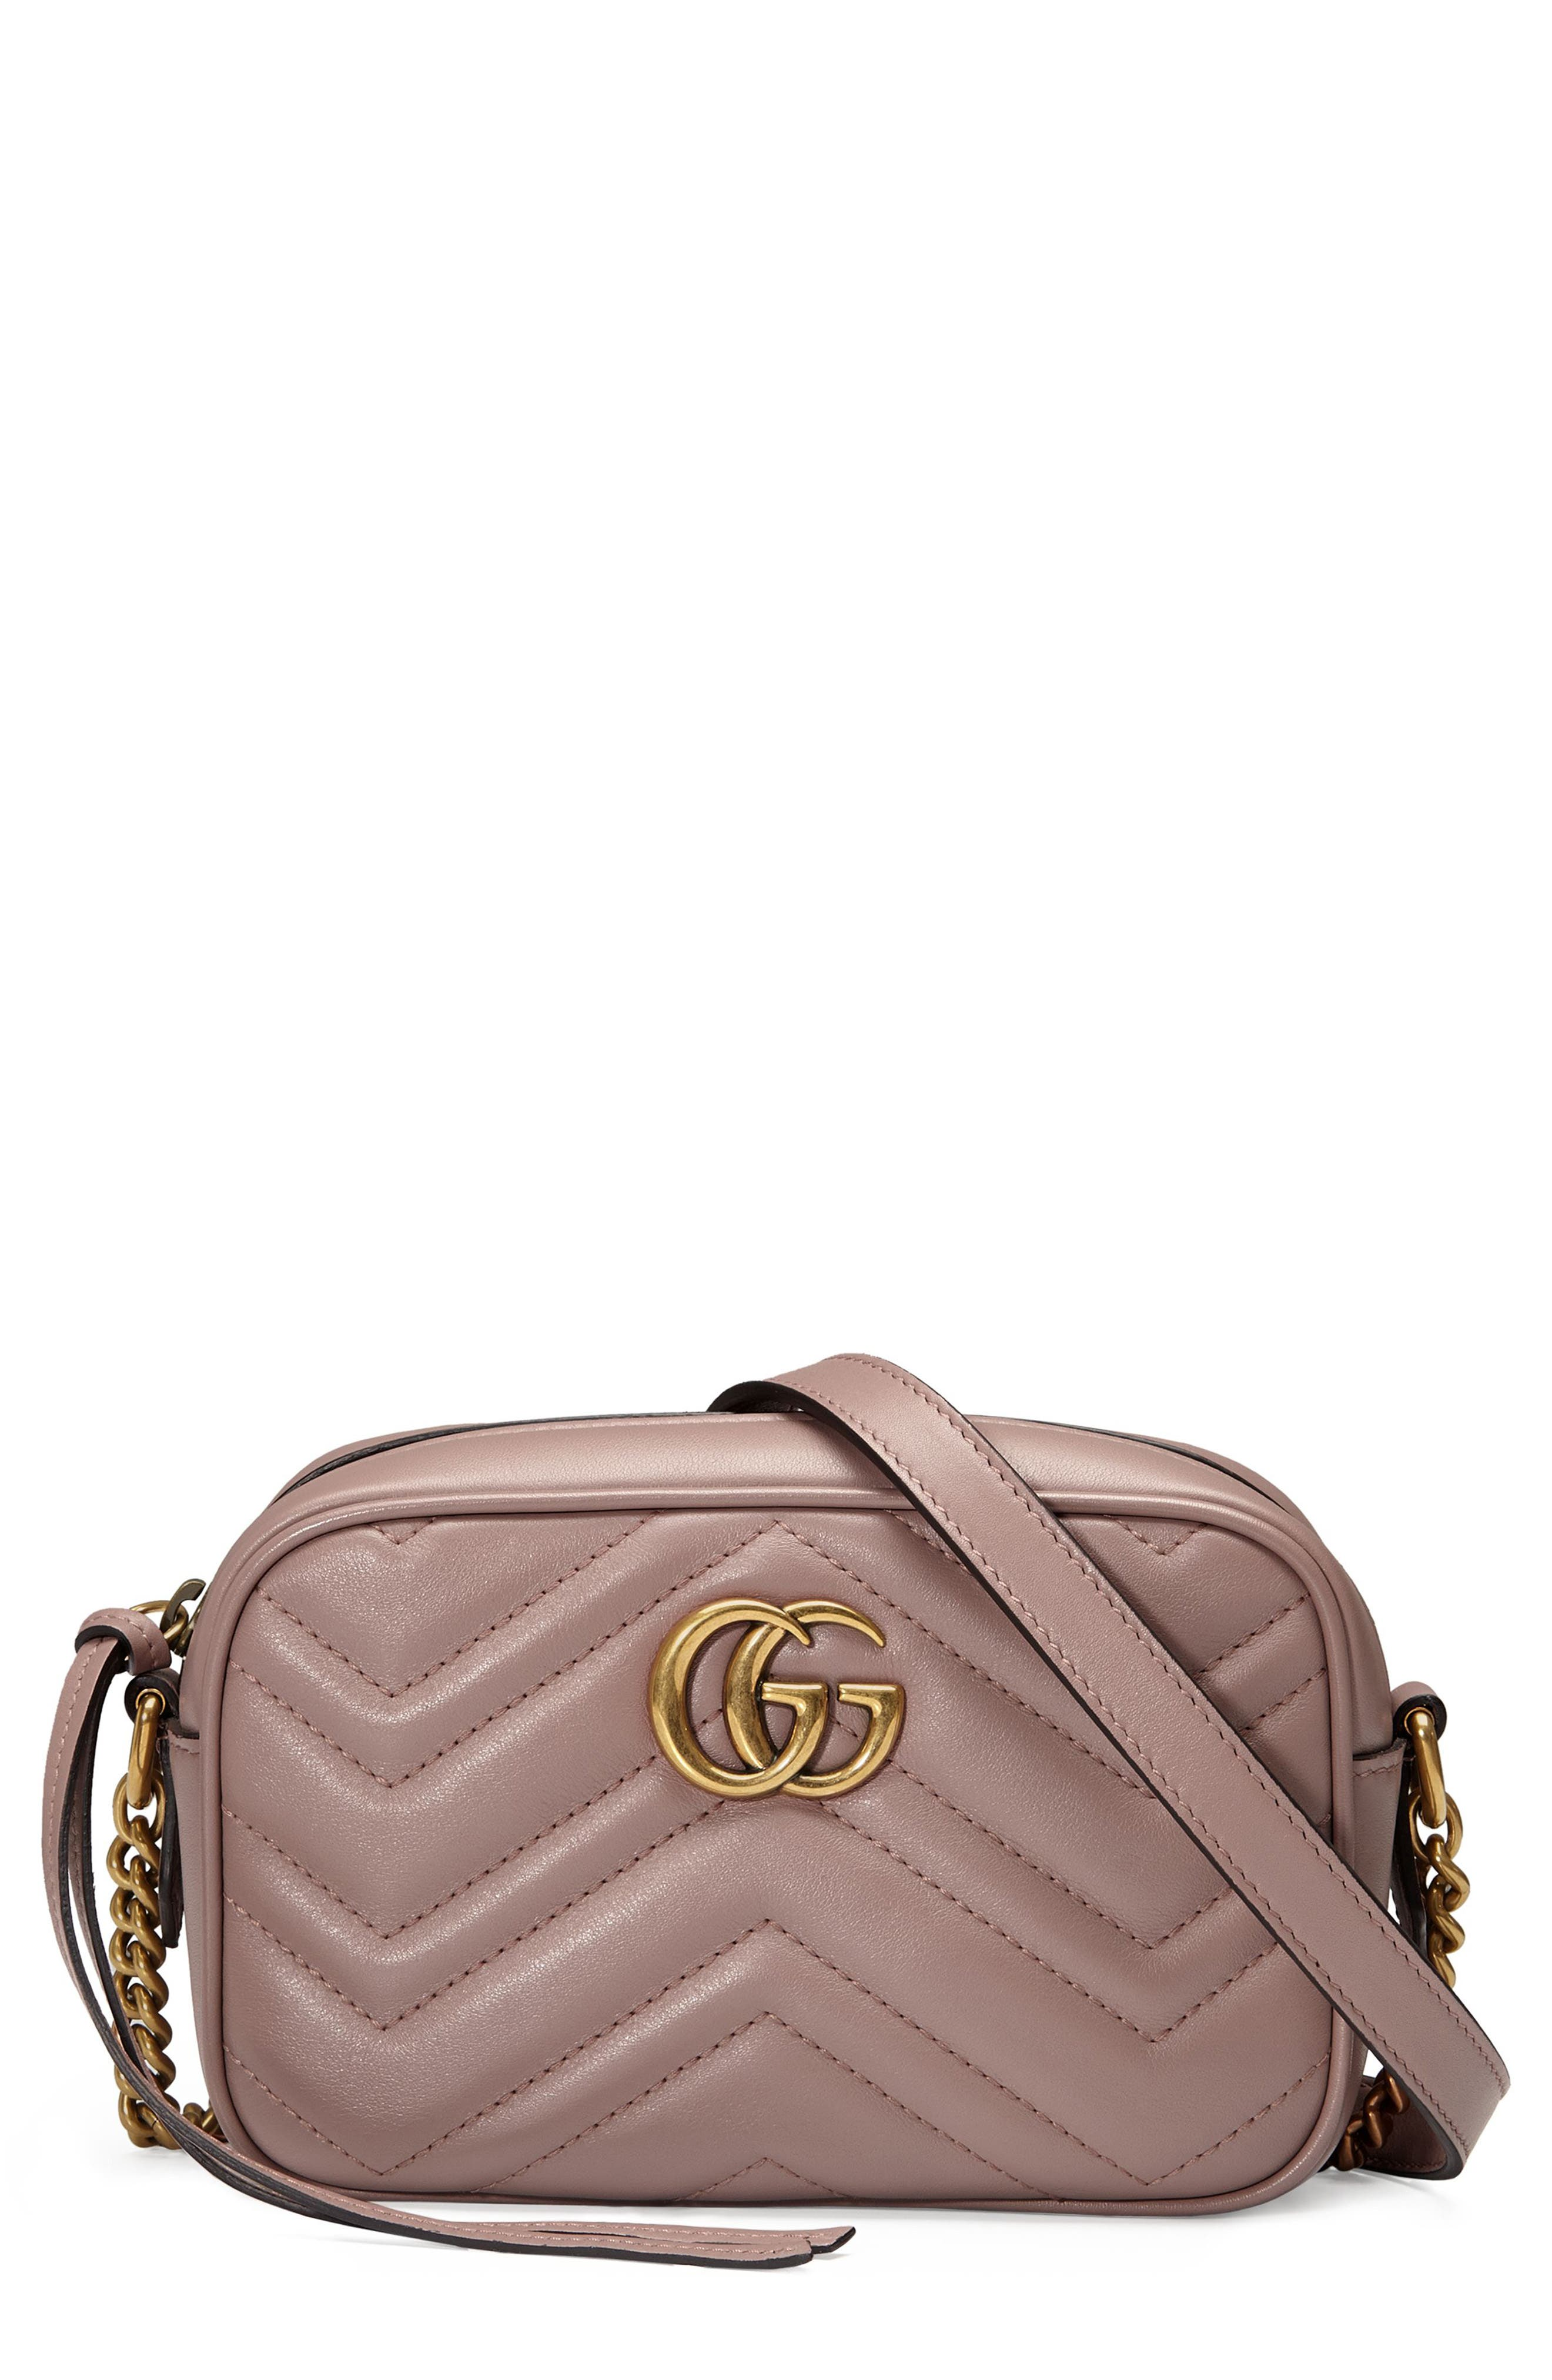 Designer gucci handbags for women exclusive photo